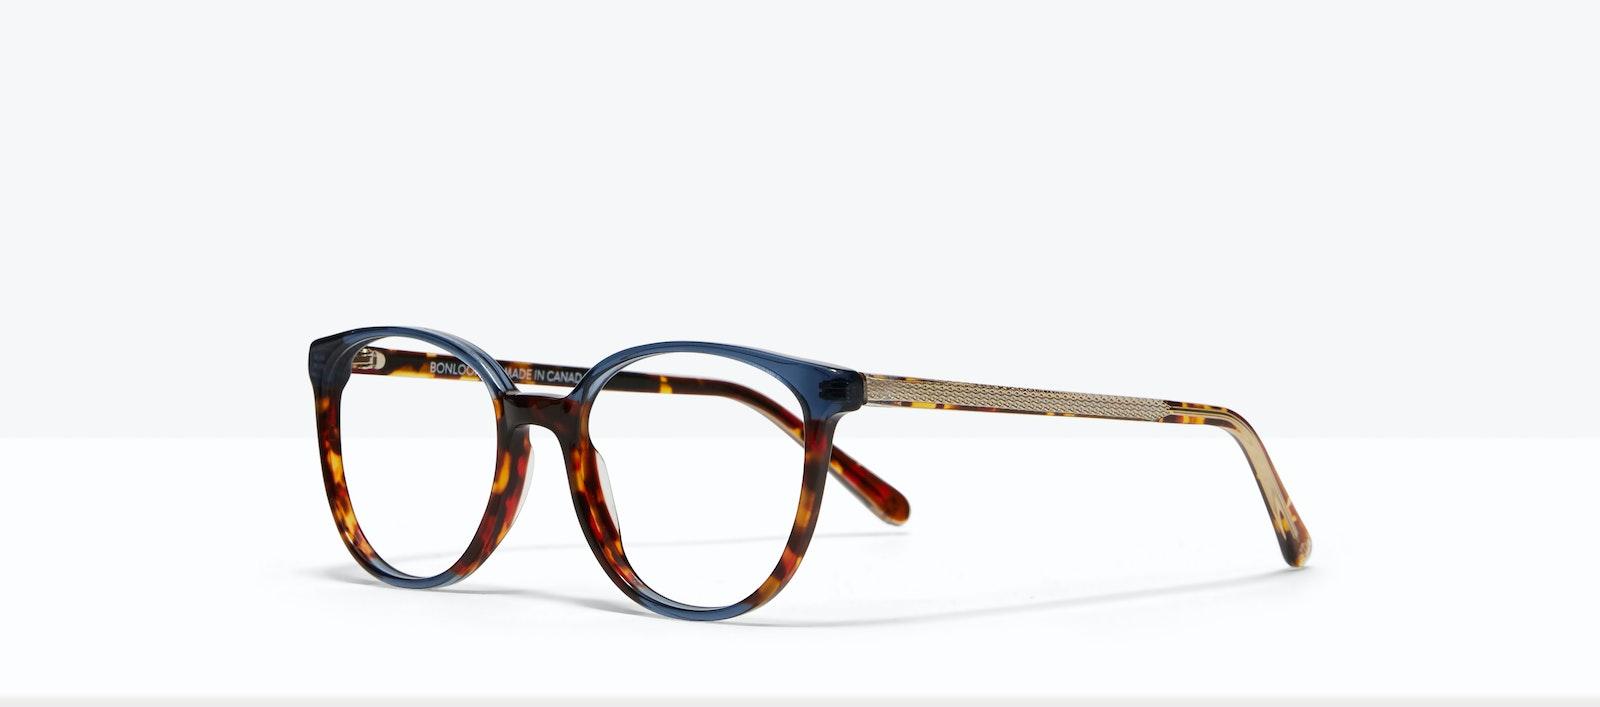 Affordable Fashion Glasses Round Eyeglasses Women Fauna Atlantic Tilt